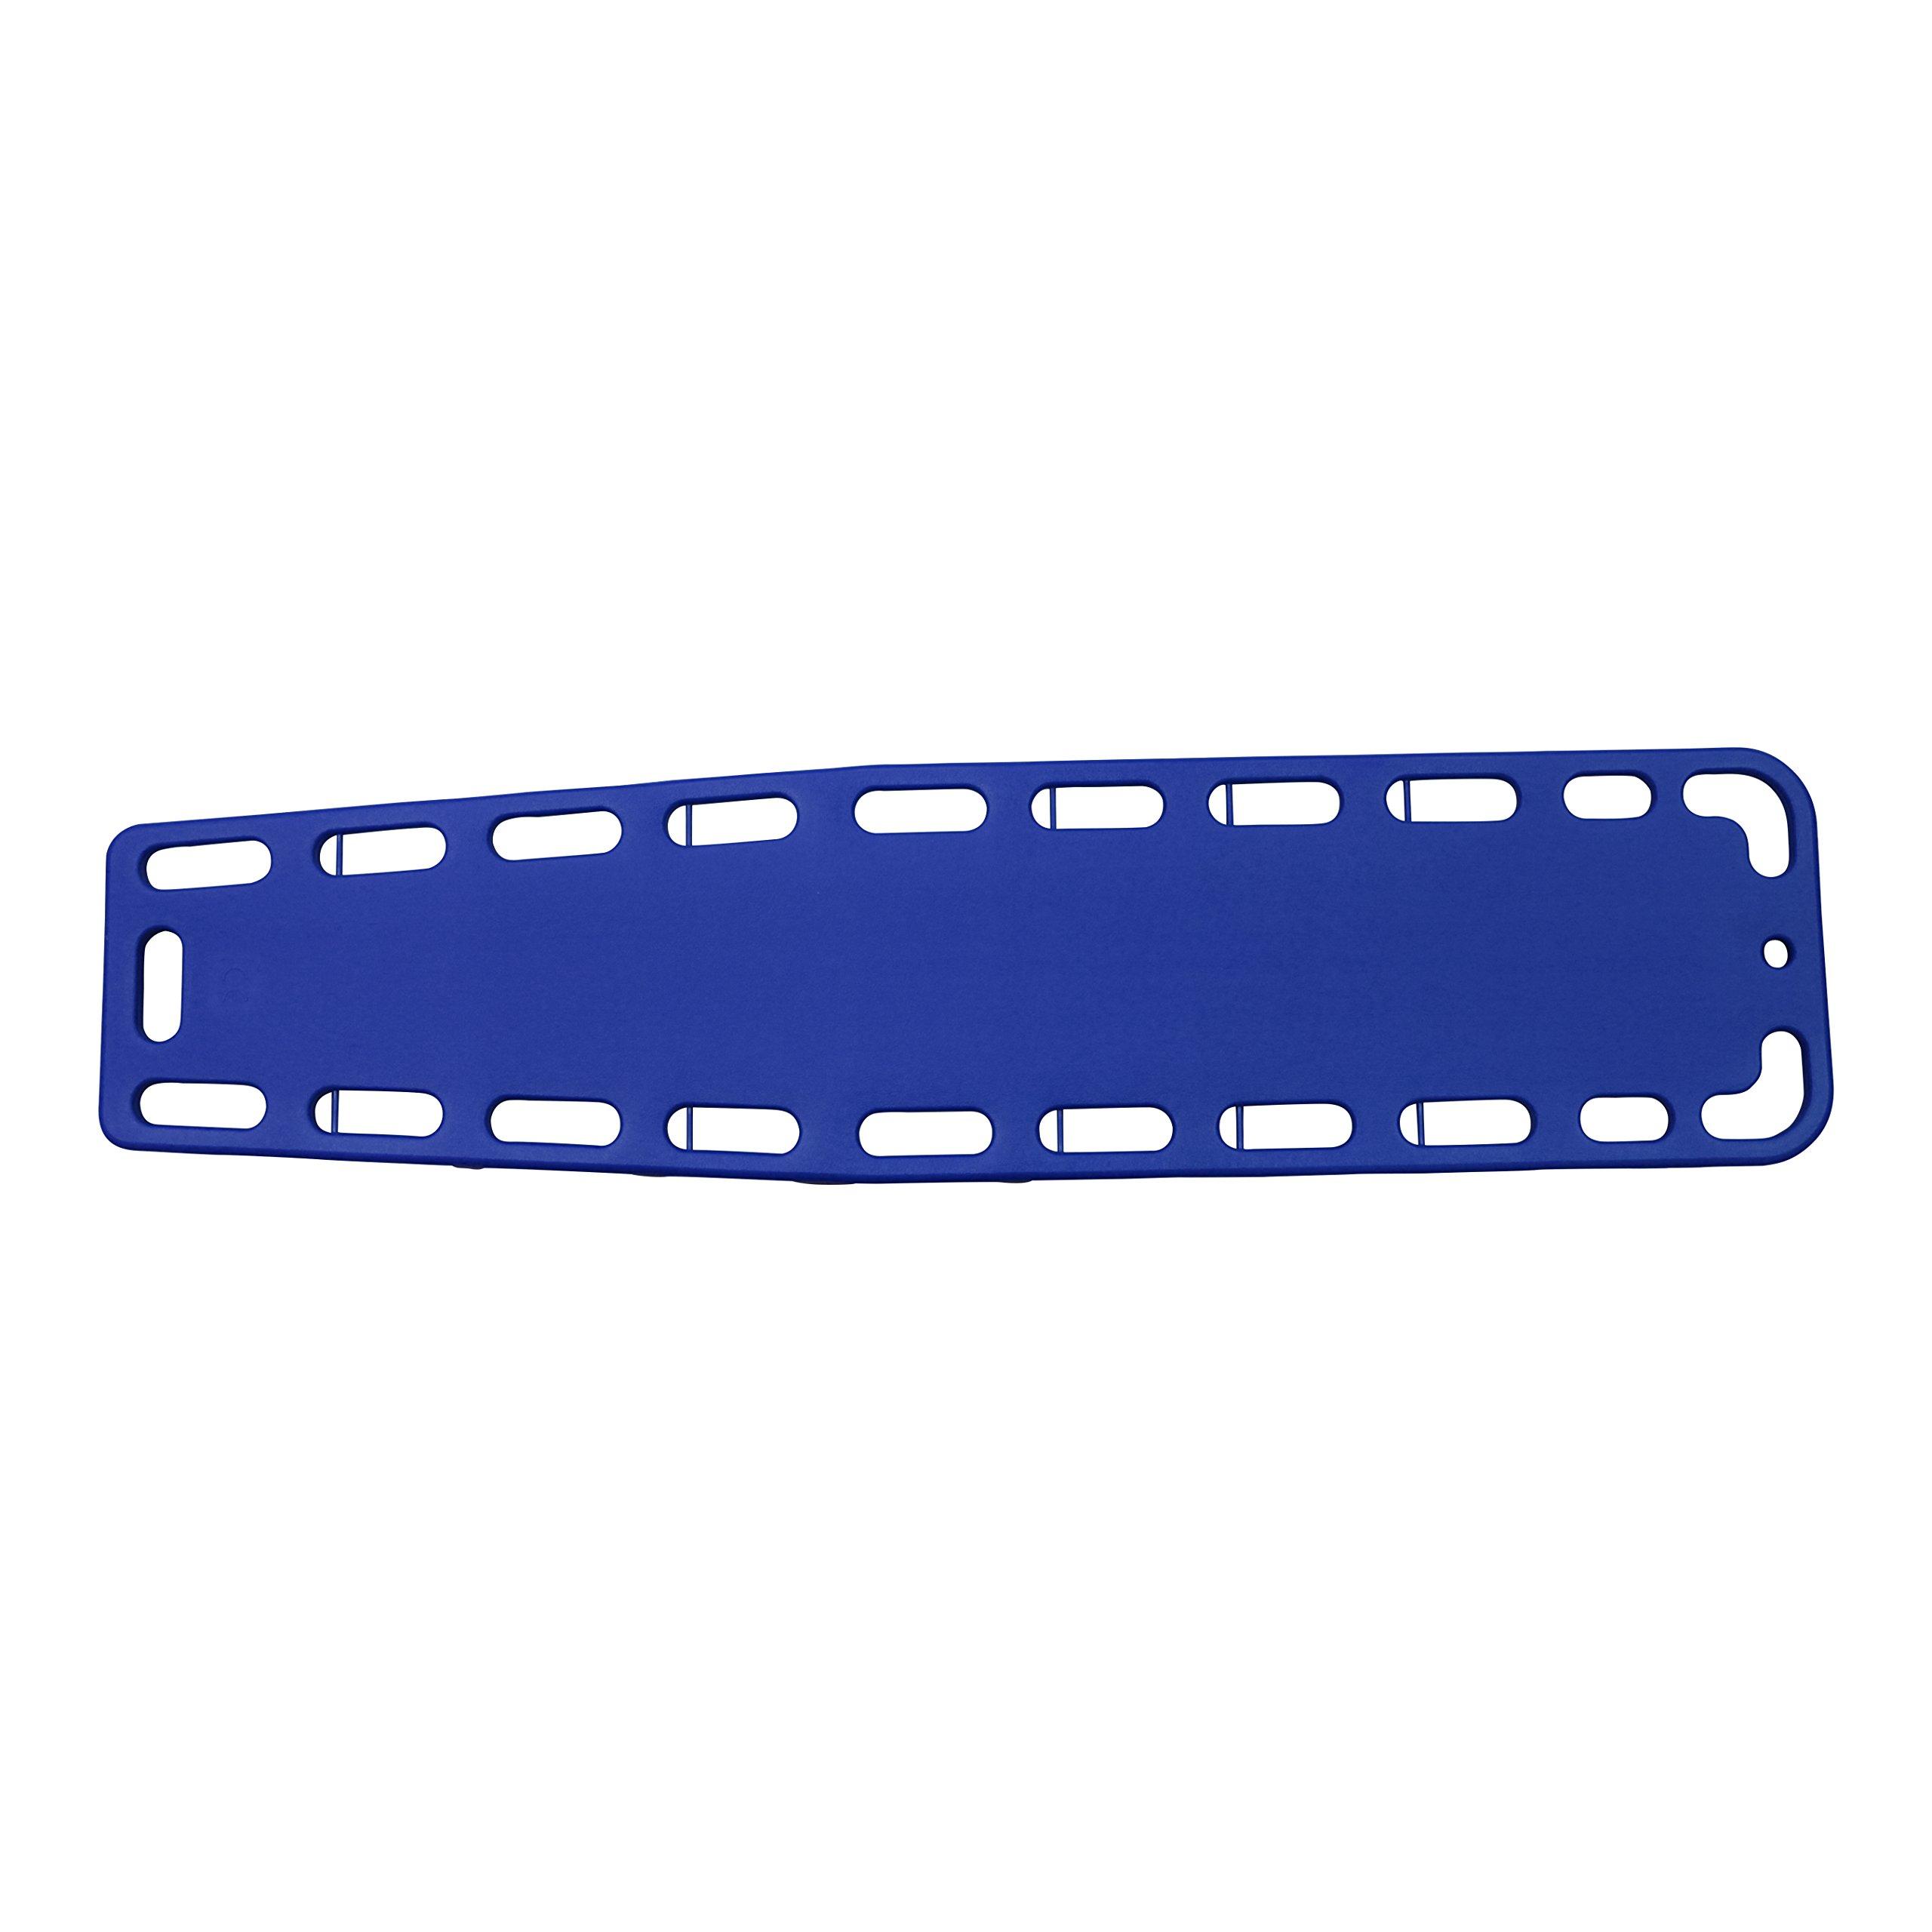 Kemp 10-993 Royal Blue Spineboard